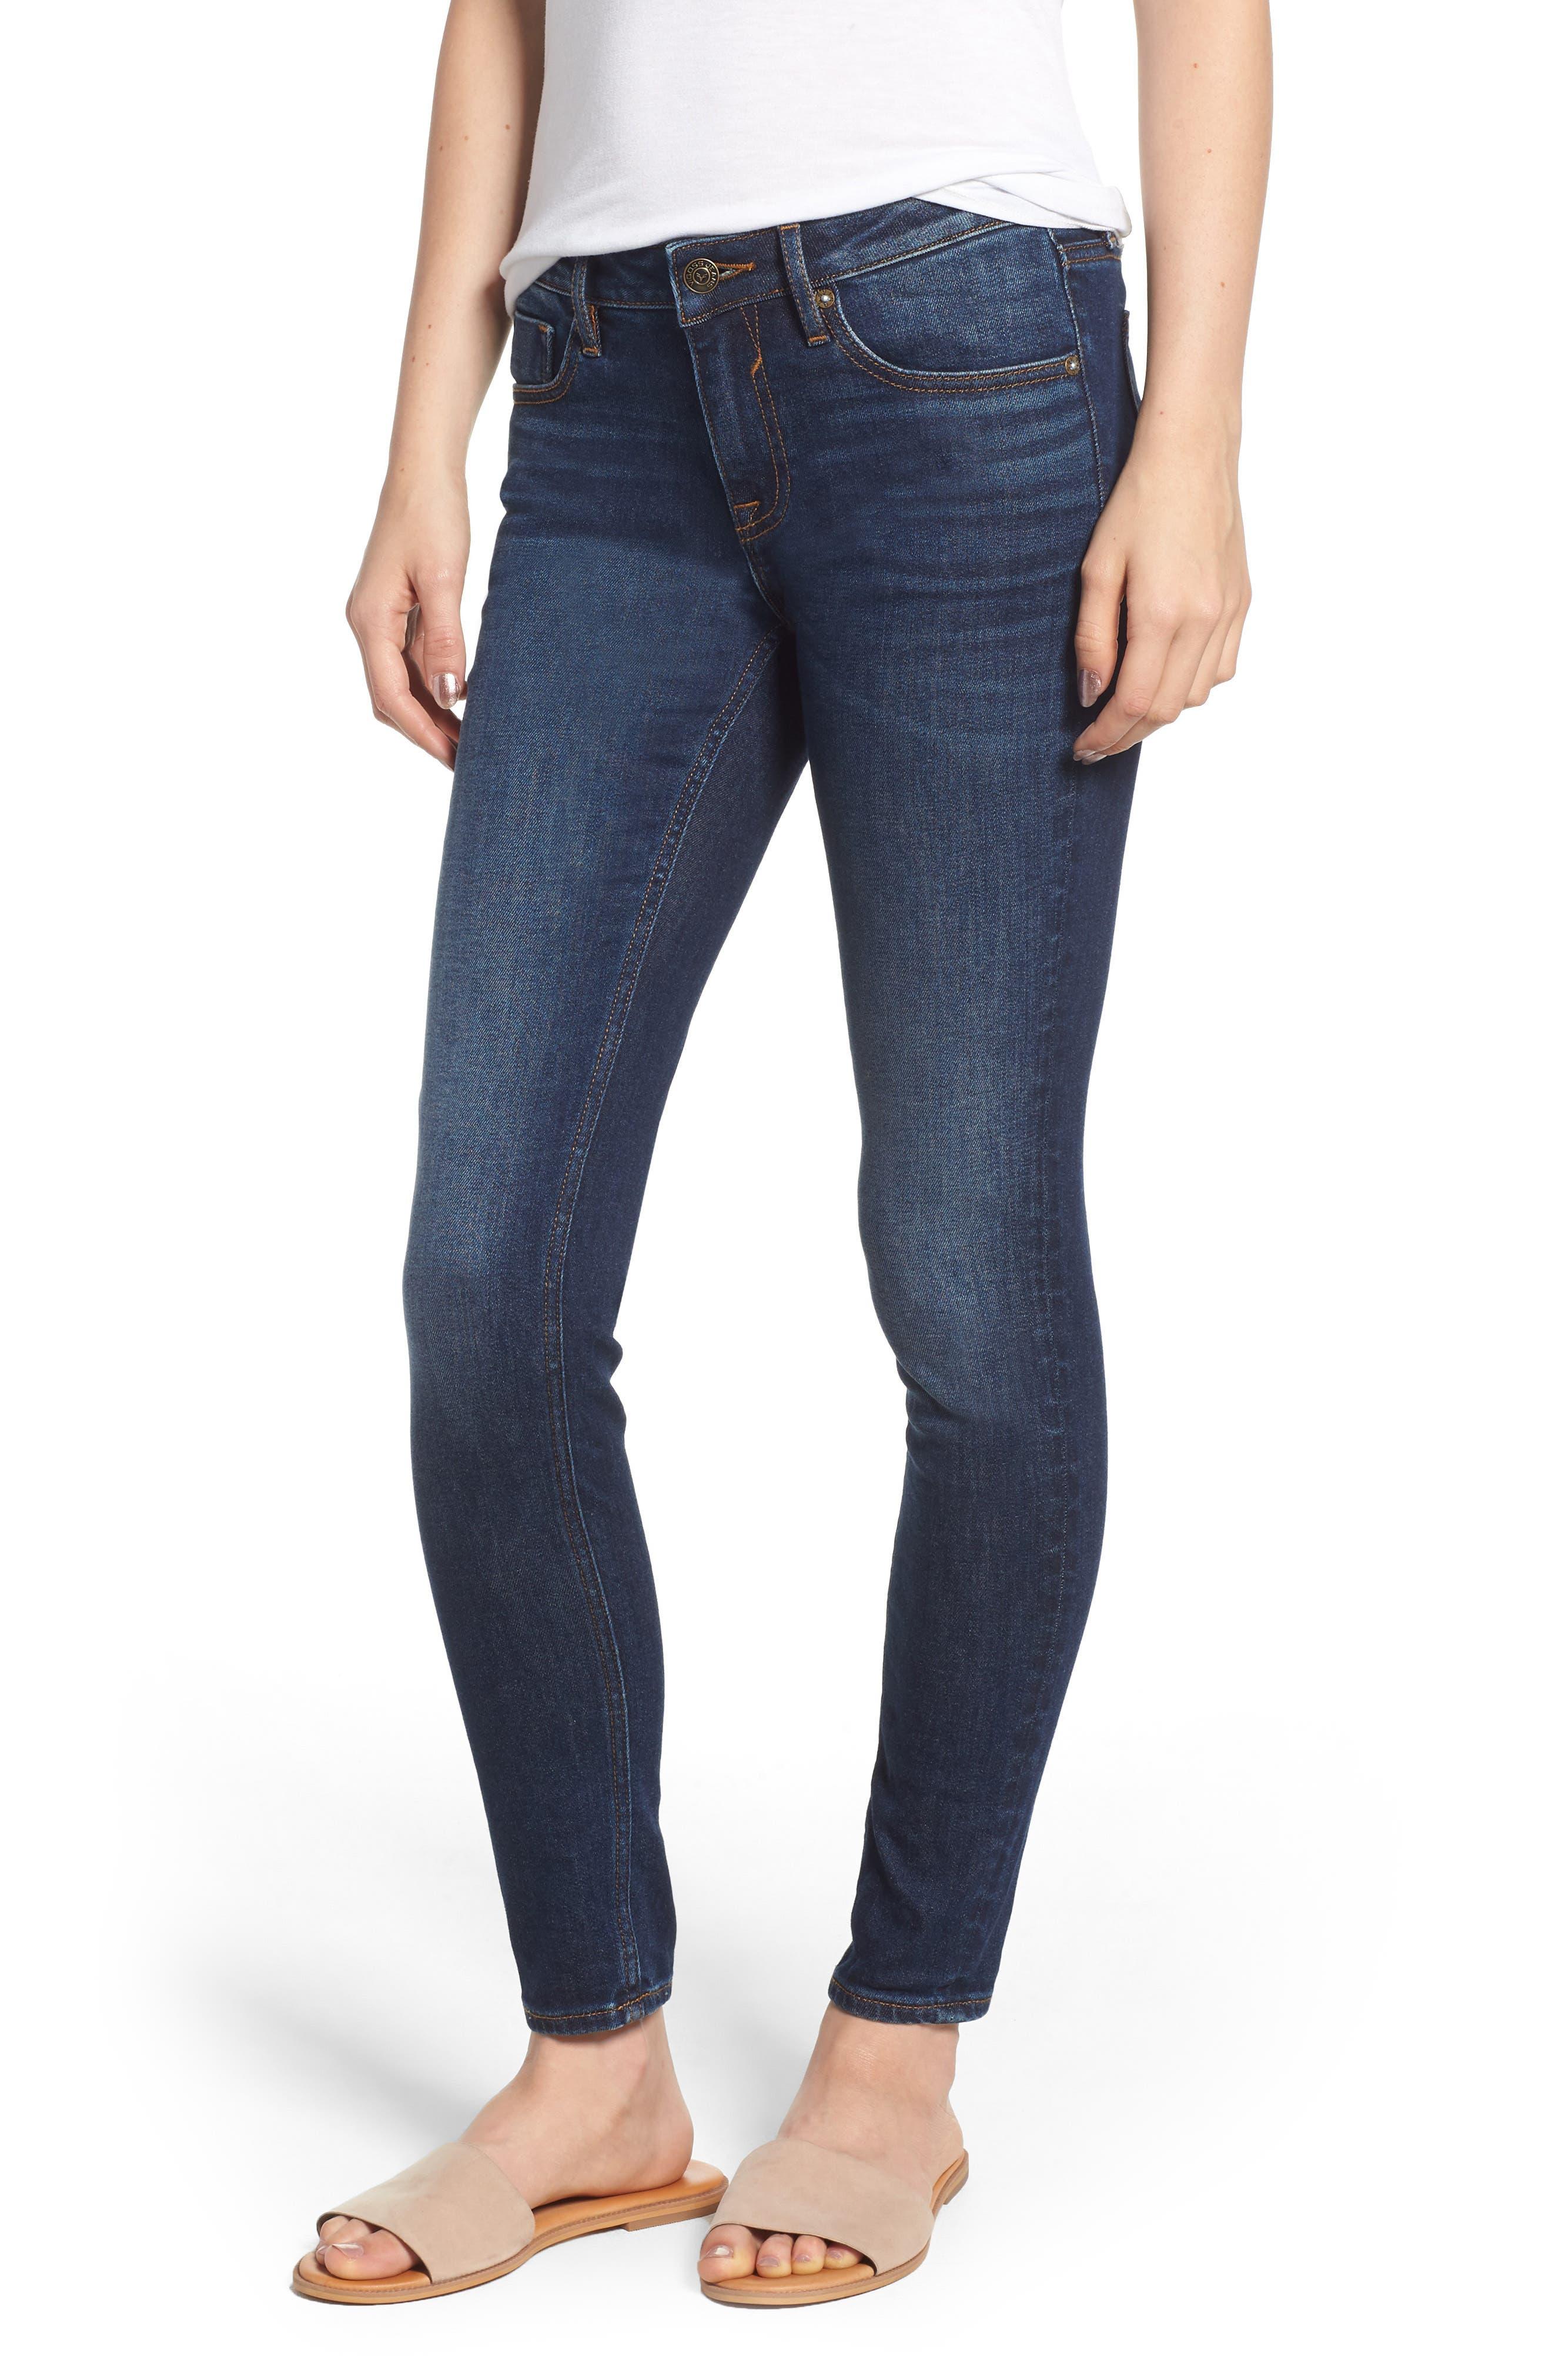 Jagger Skinny Jeans,                         Main,                         color, DARK WASH